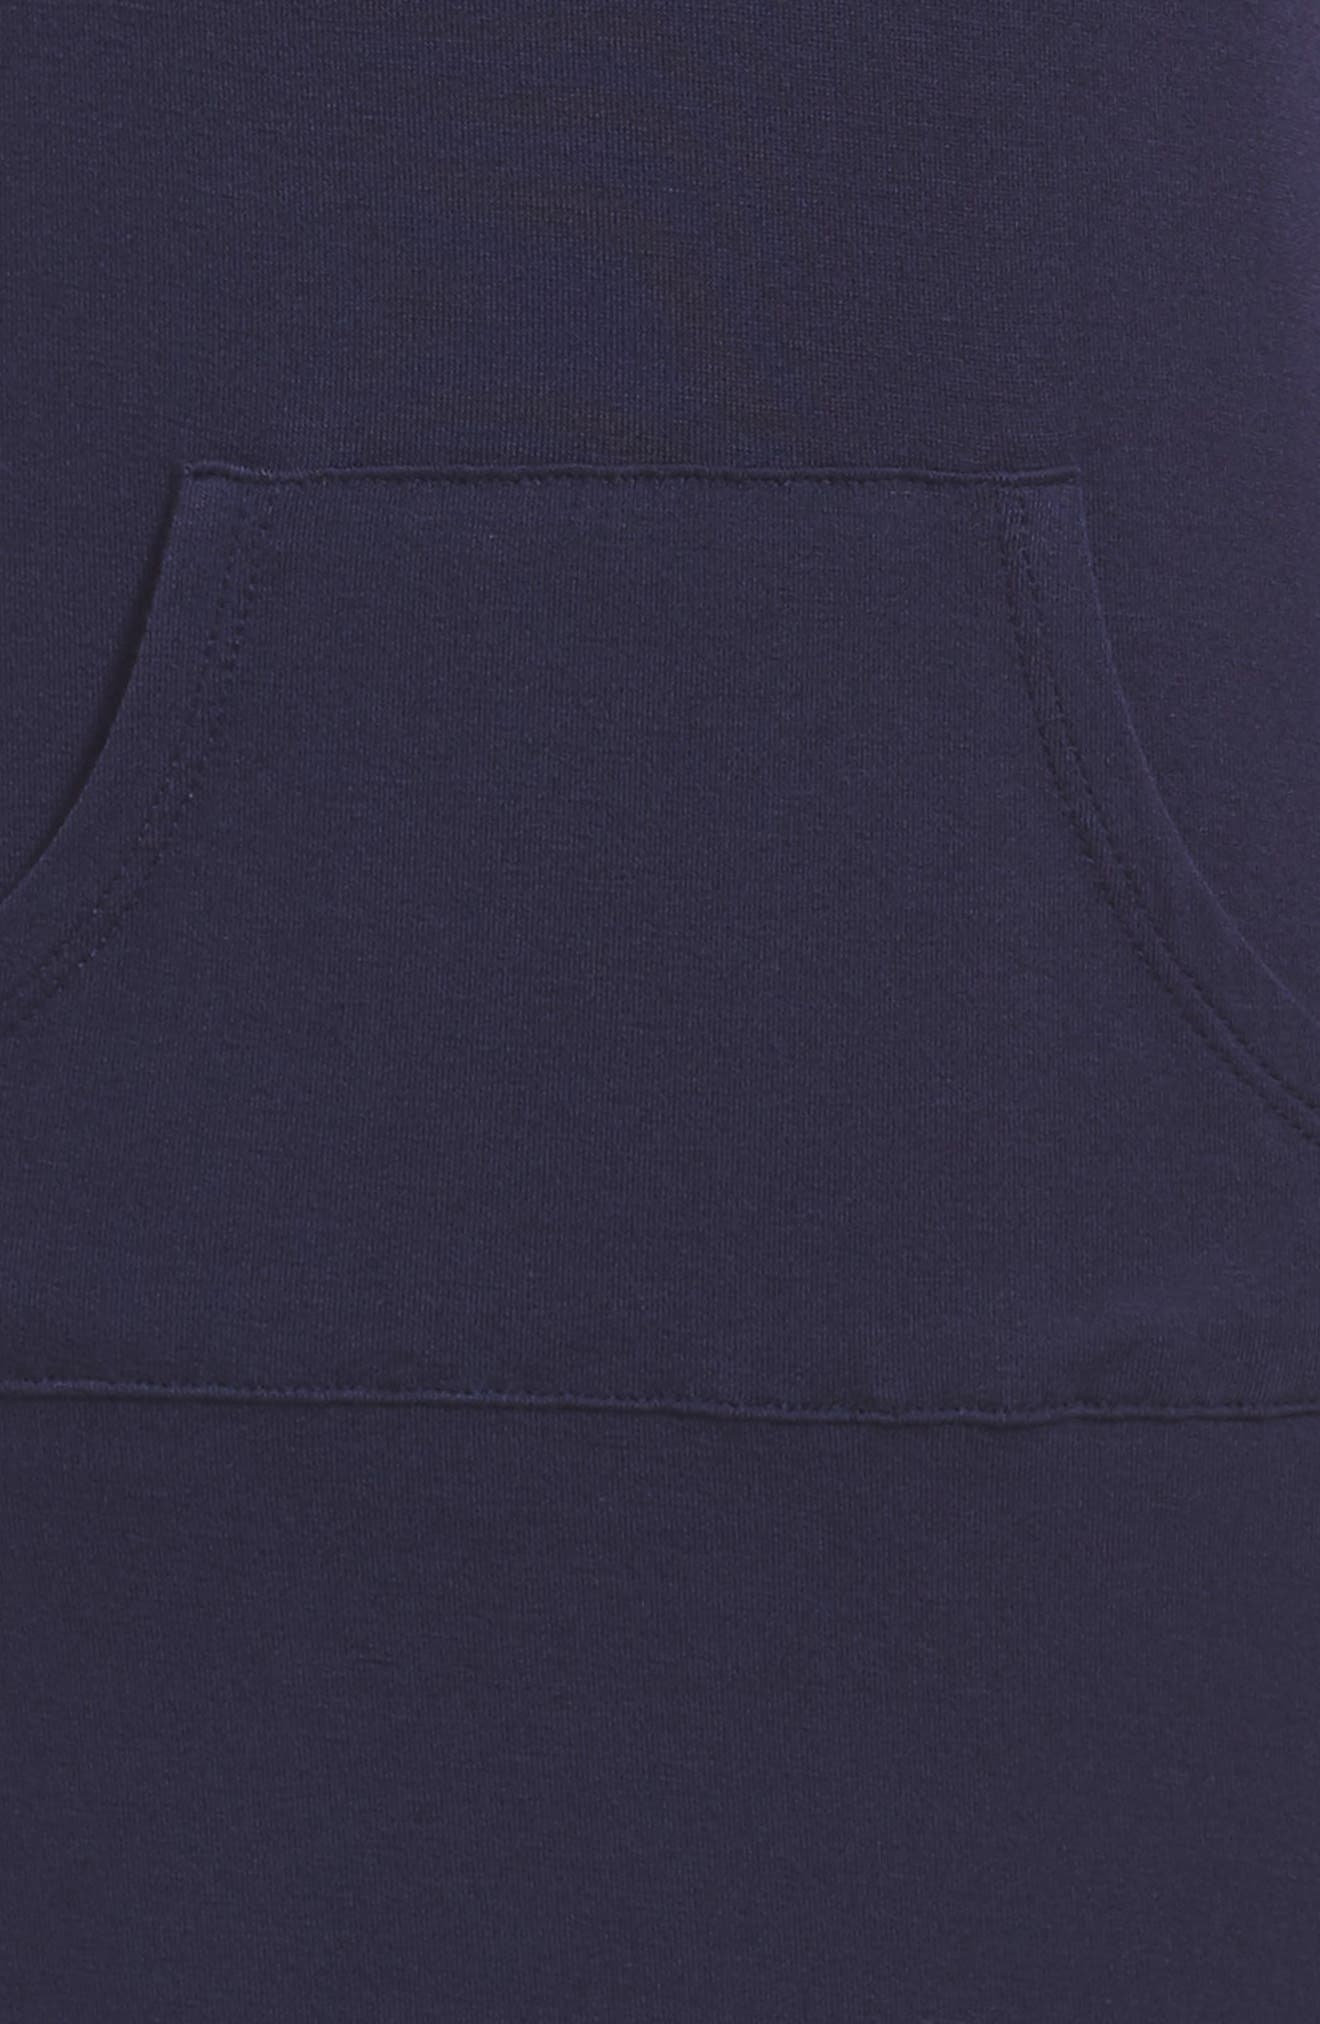 Knit Hoodie Dress,                             Alternate thumbnail 3, color,                             413